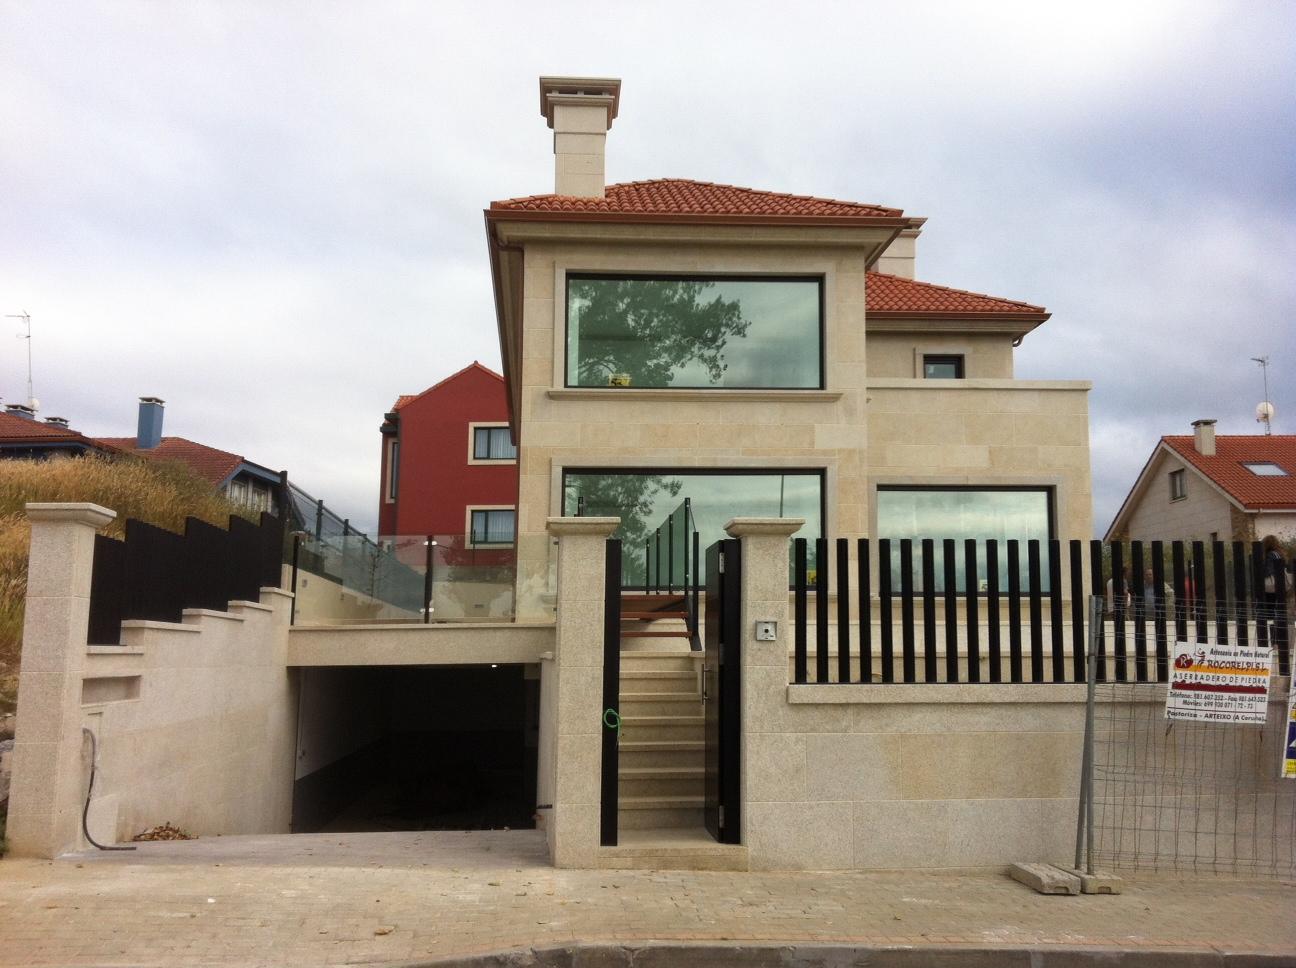 Arquitectura fernando pousada garcia for Fachadas casas unifamiliares